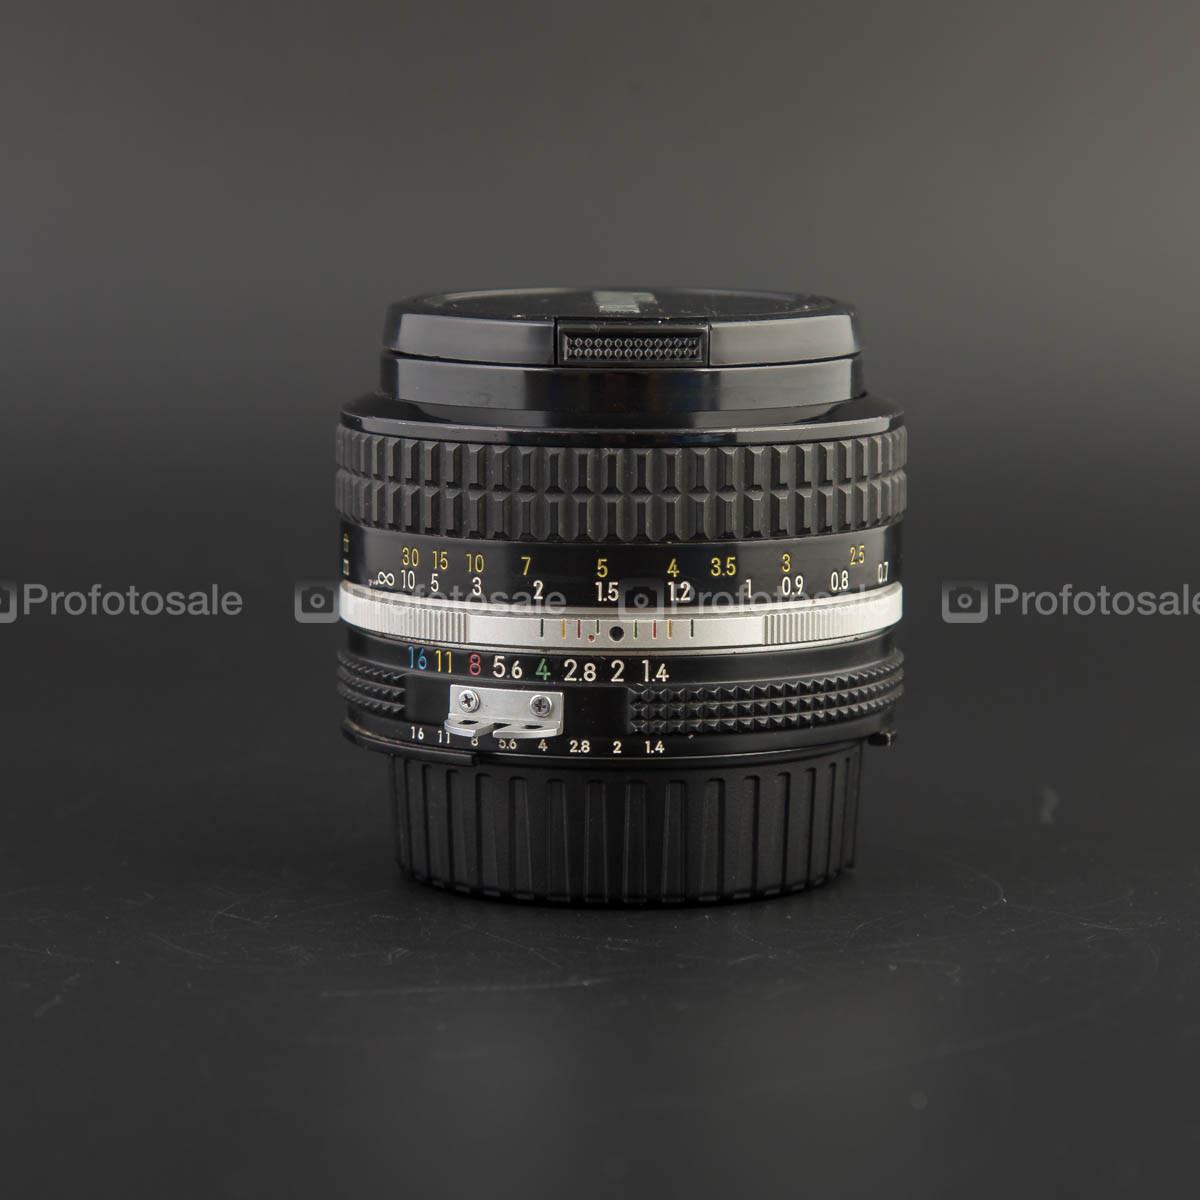 Nikon 50 mm f/1.4